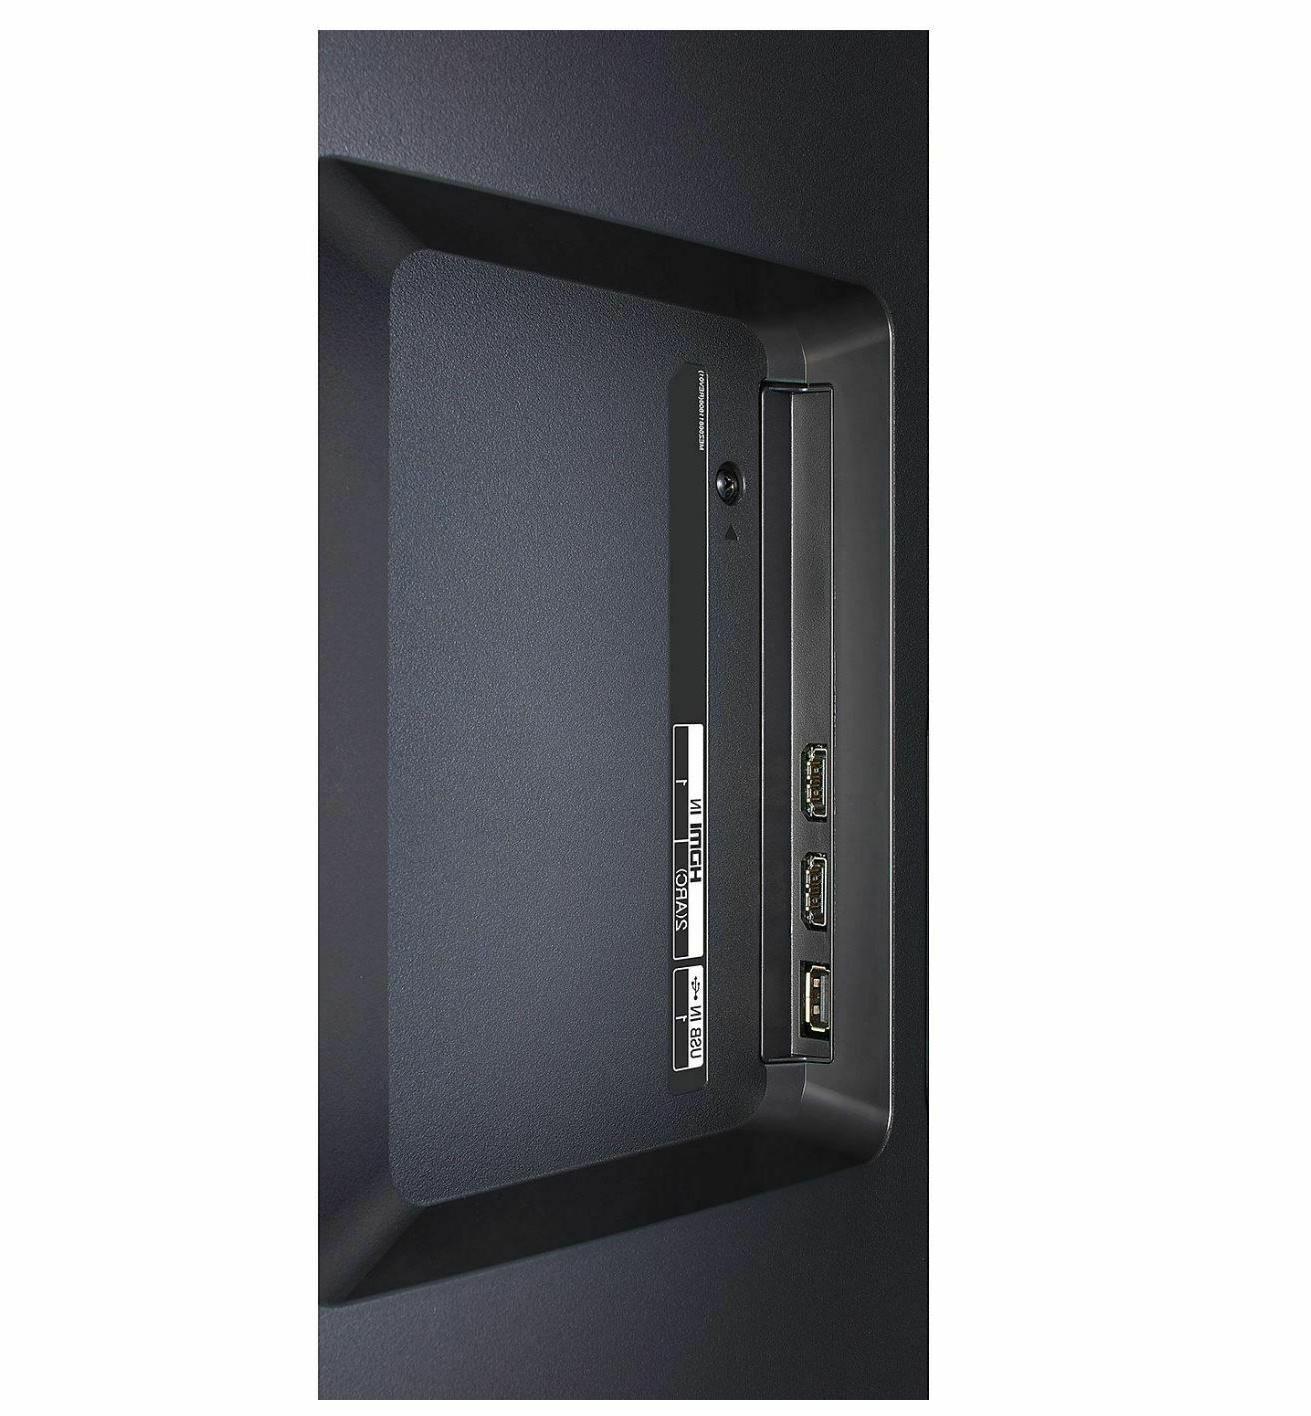 55 Inch 4K HD LG 7300 Series ThinQ 2019